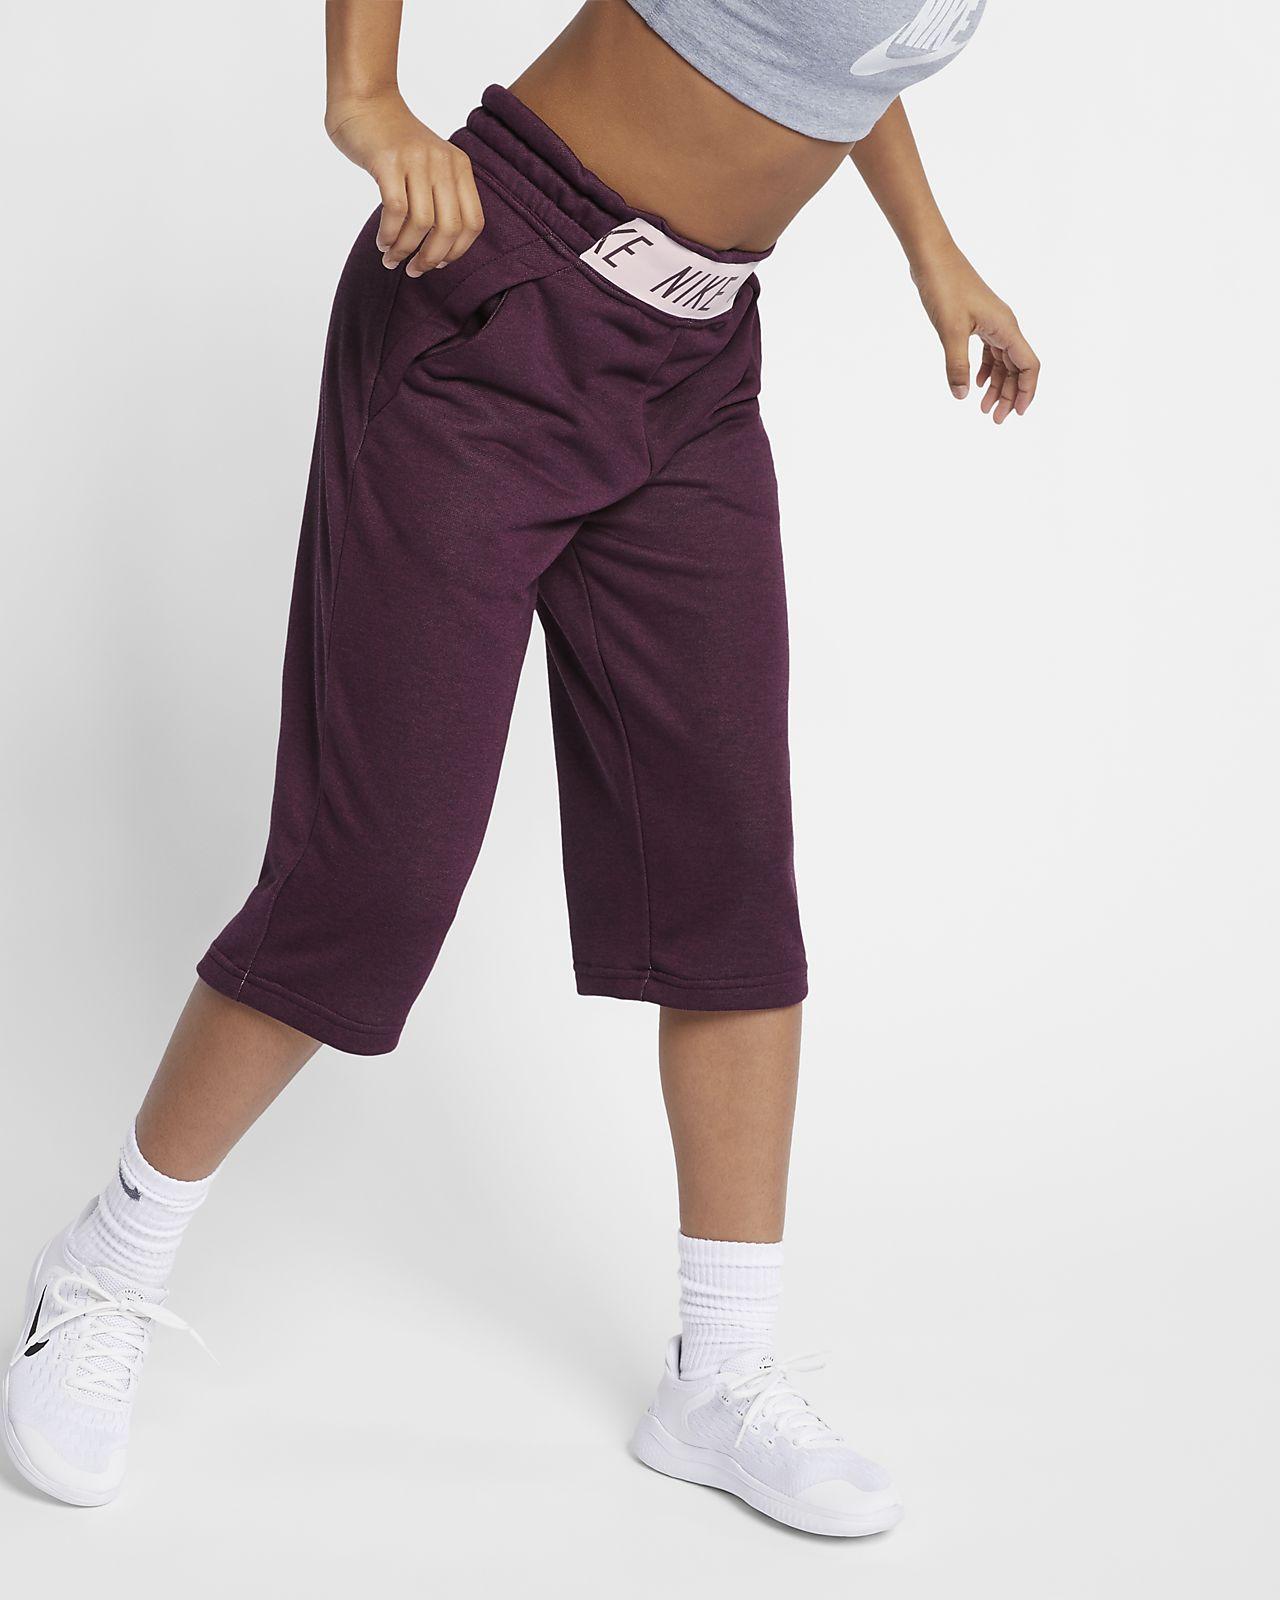 Nike Older Kids' (Girls') Training Culottes